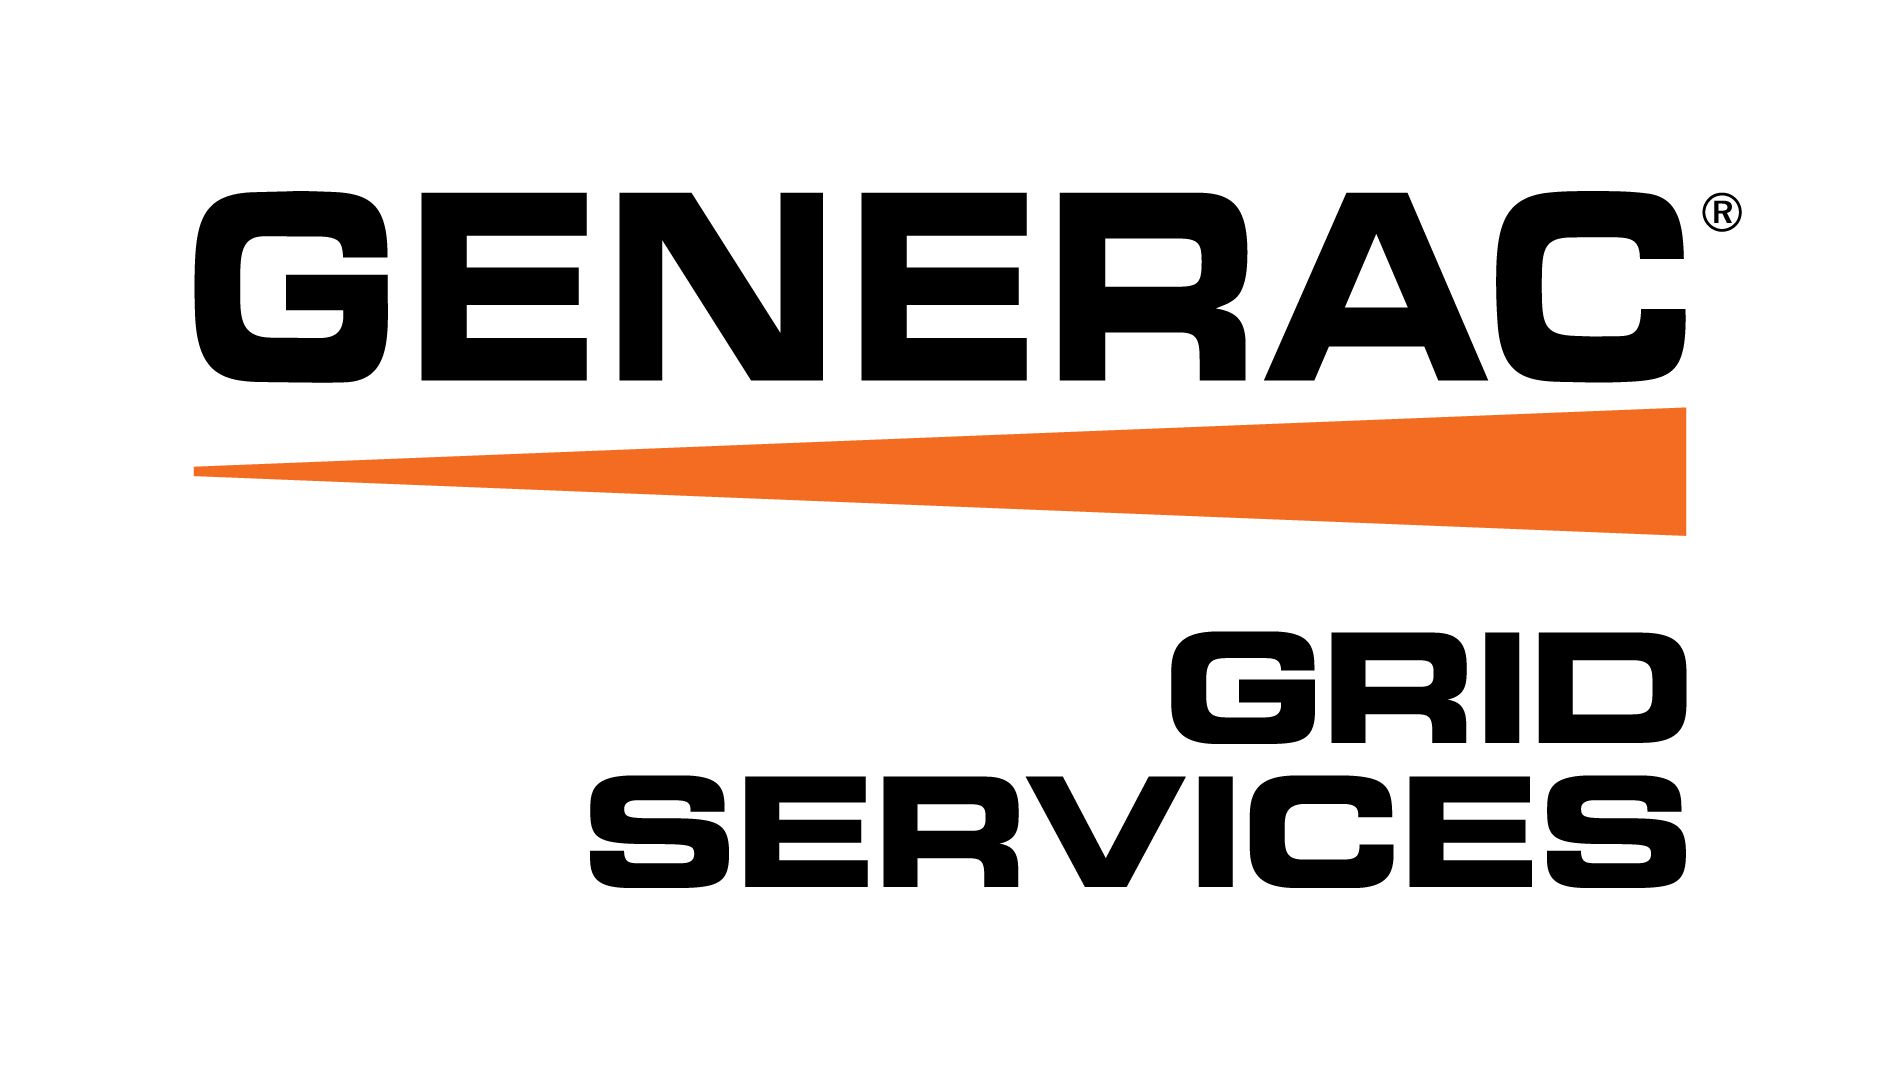 Generac Grid Services